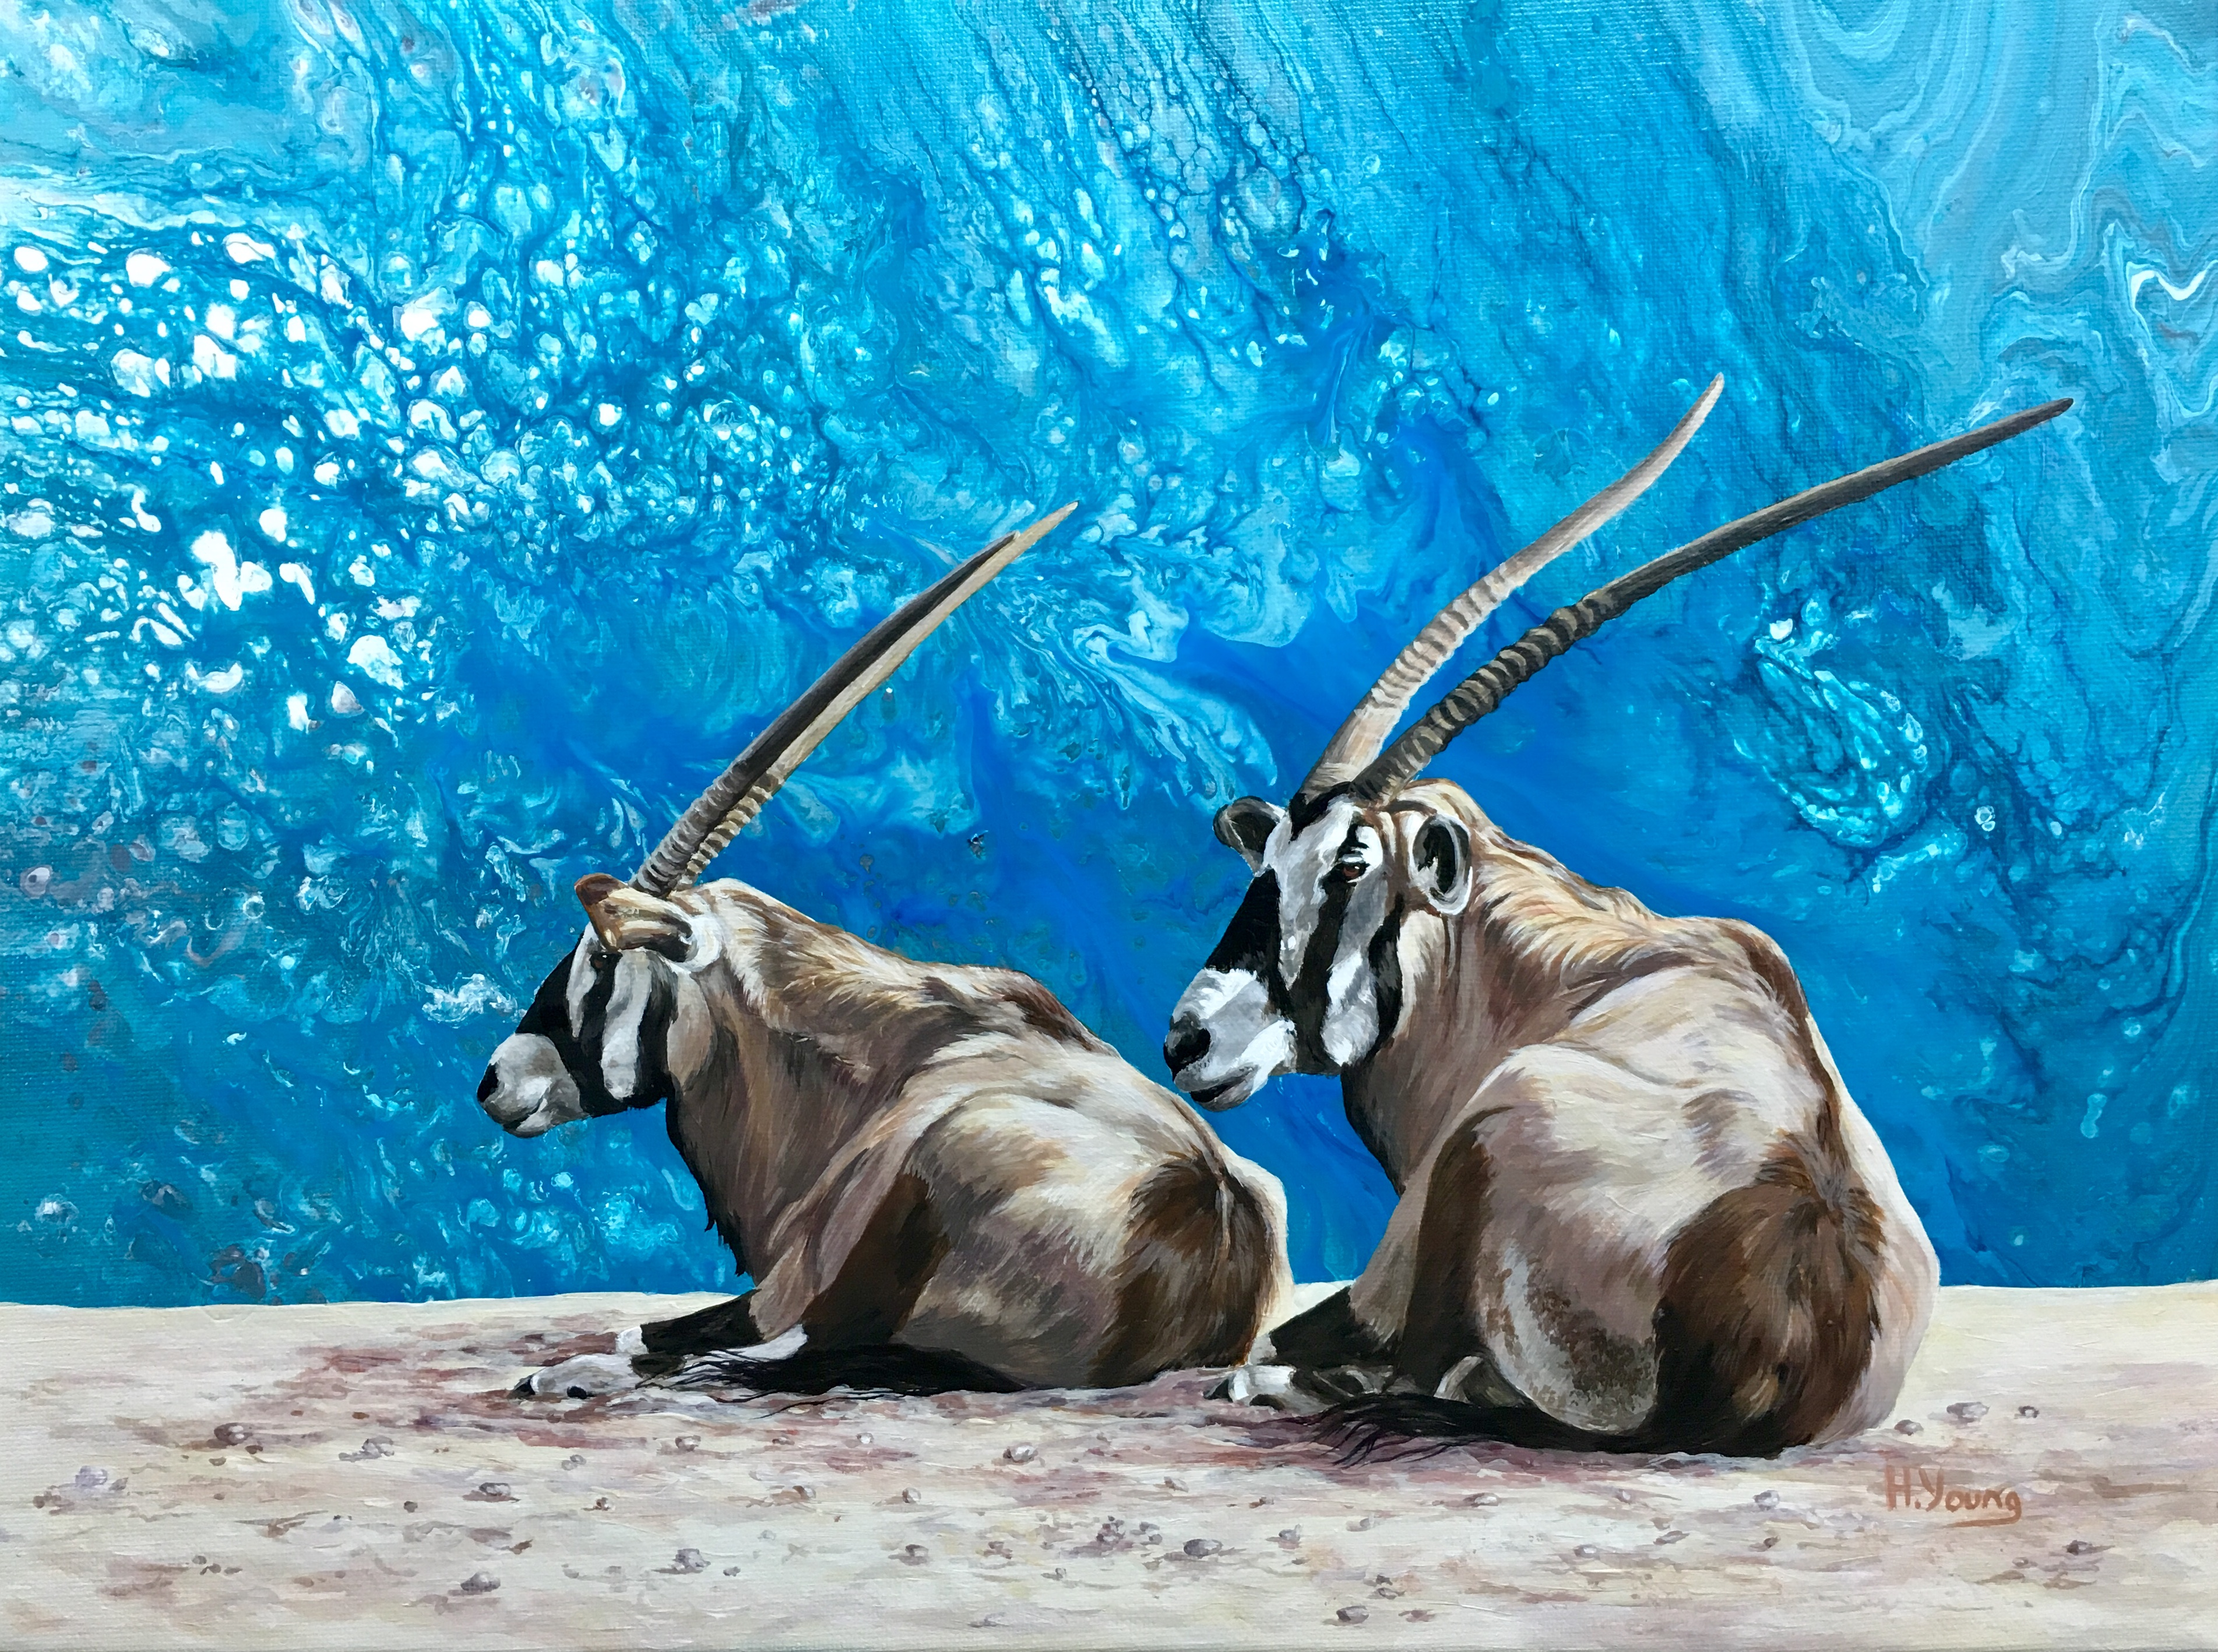 Oryx - Acrylics